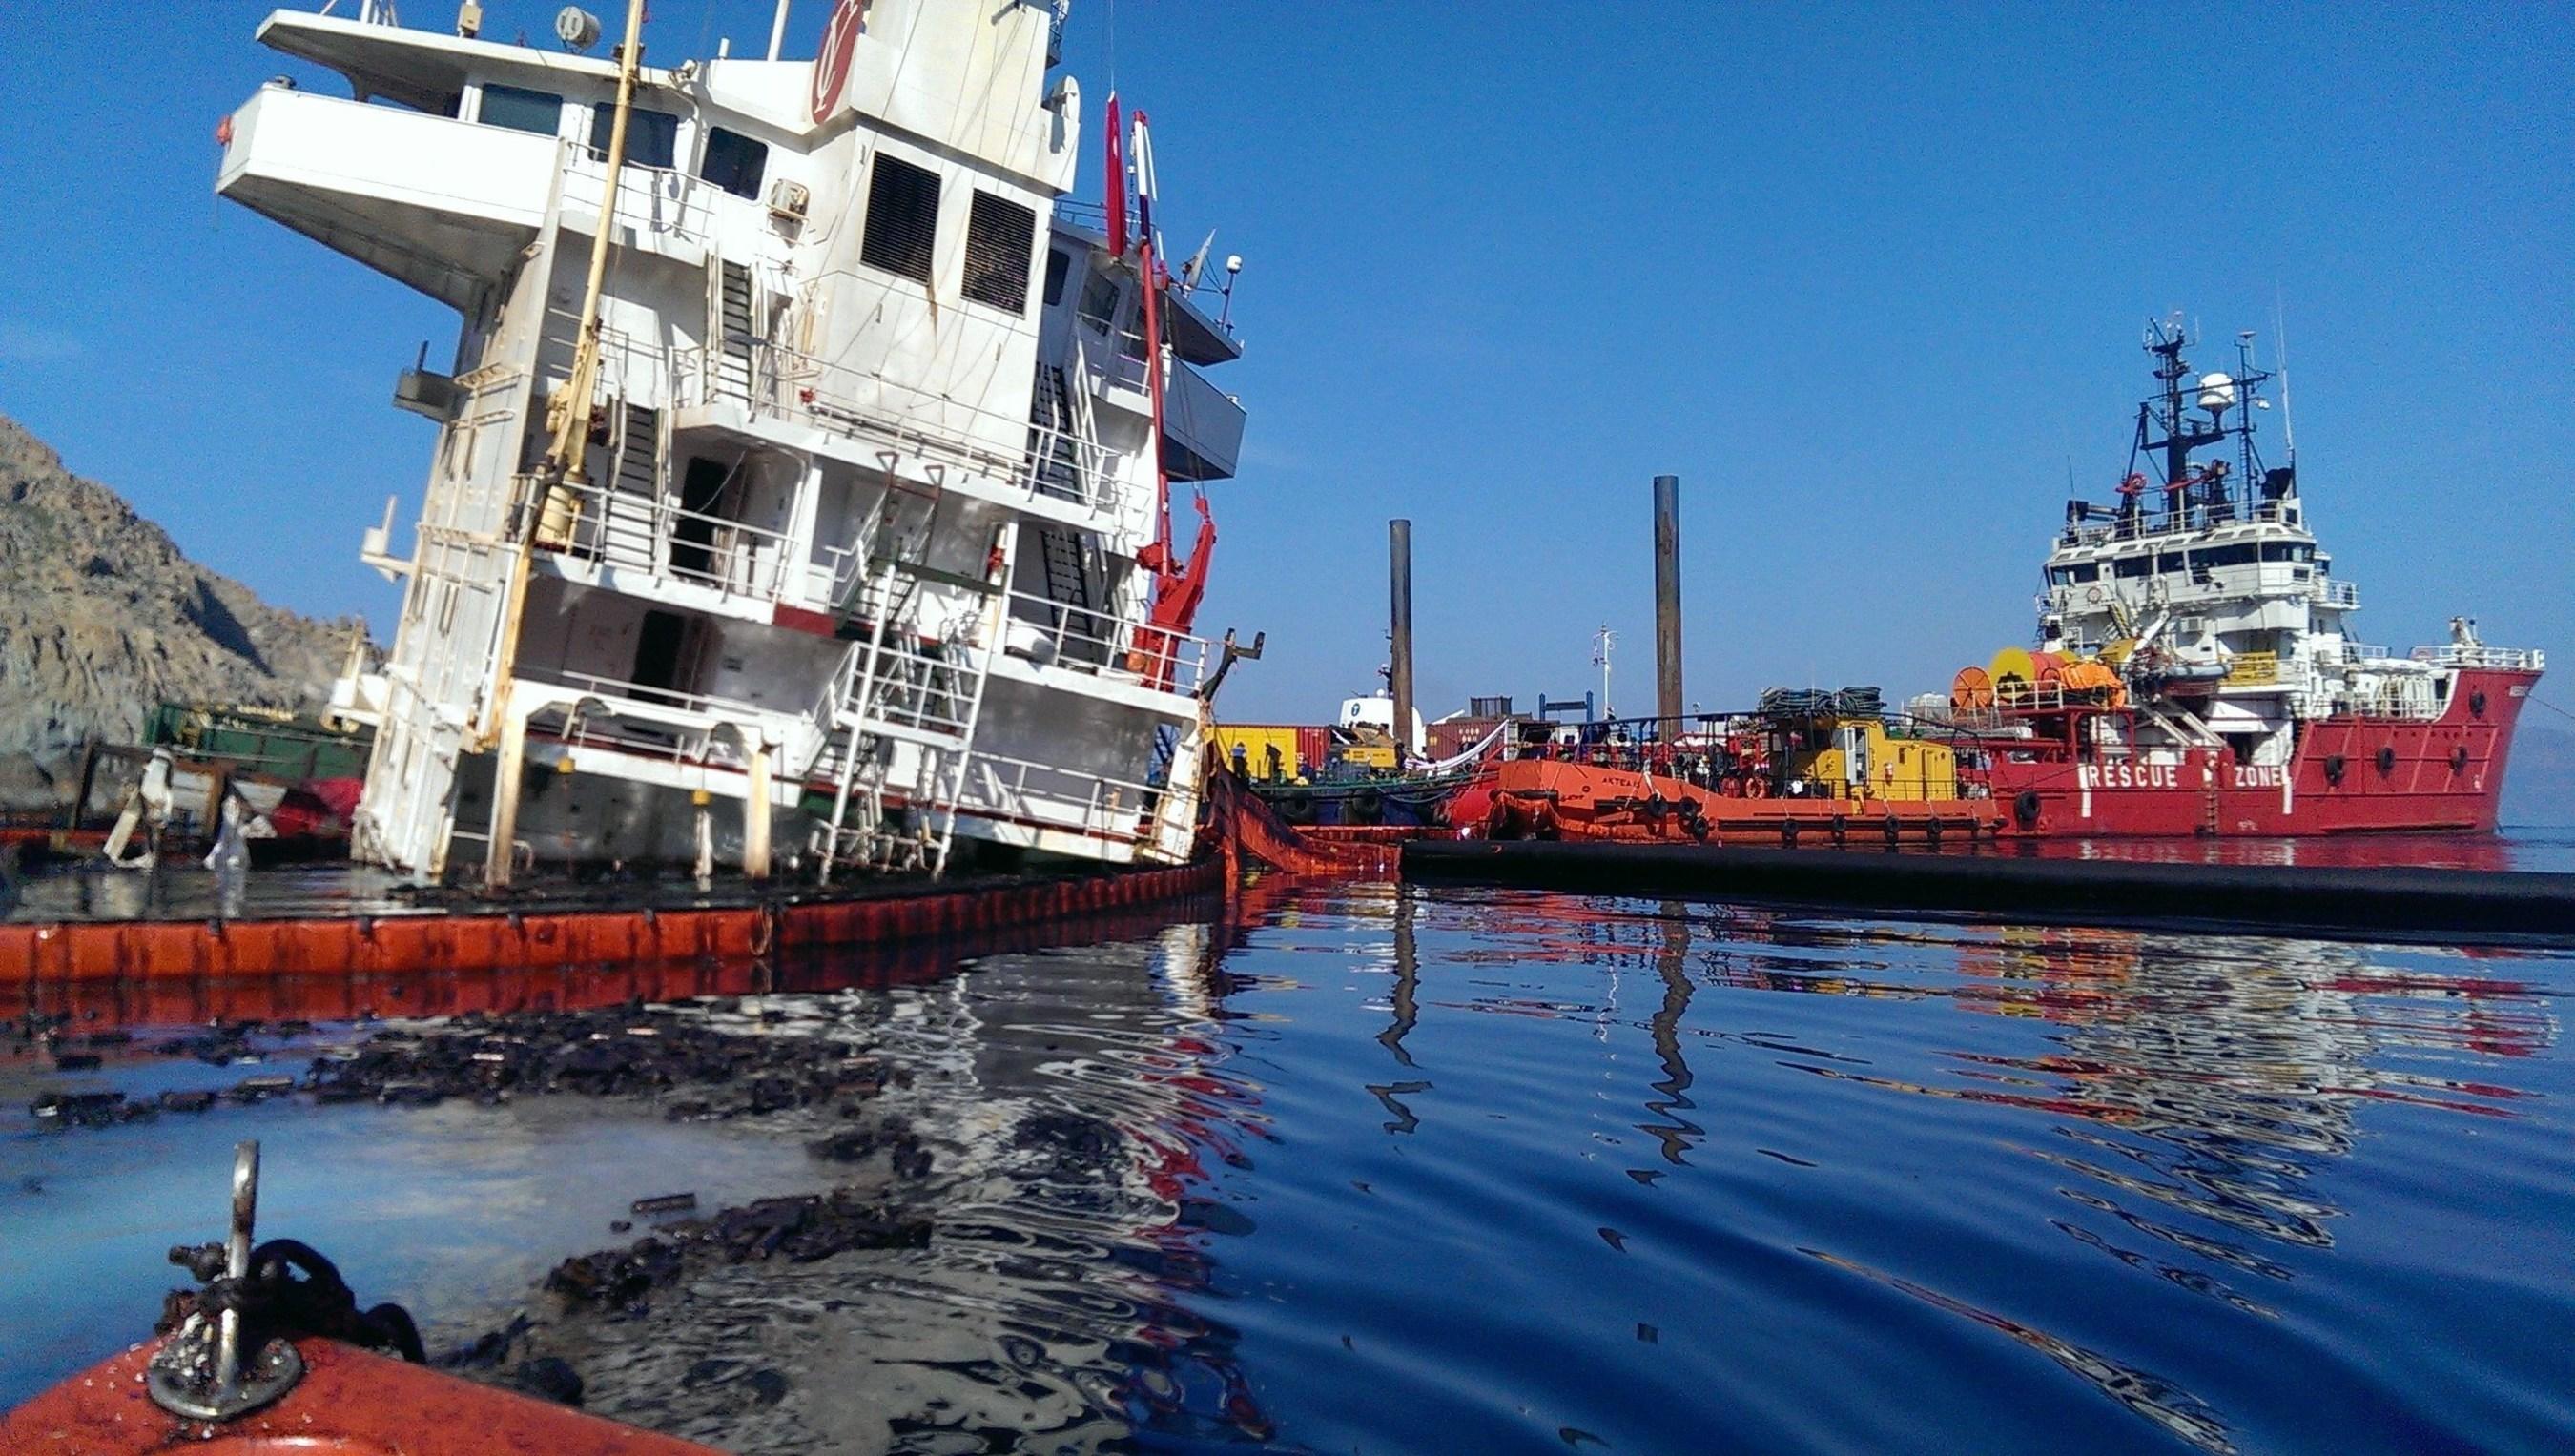 Sea Diamond incident, oil spill response operations, Santorini, Greece (PRNewsFoto/Lamor Corporation)